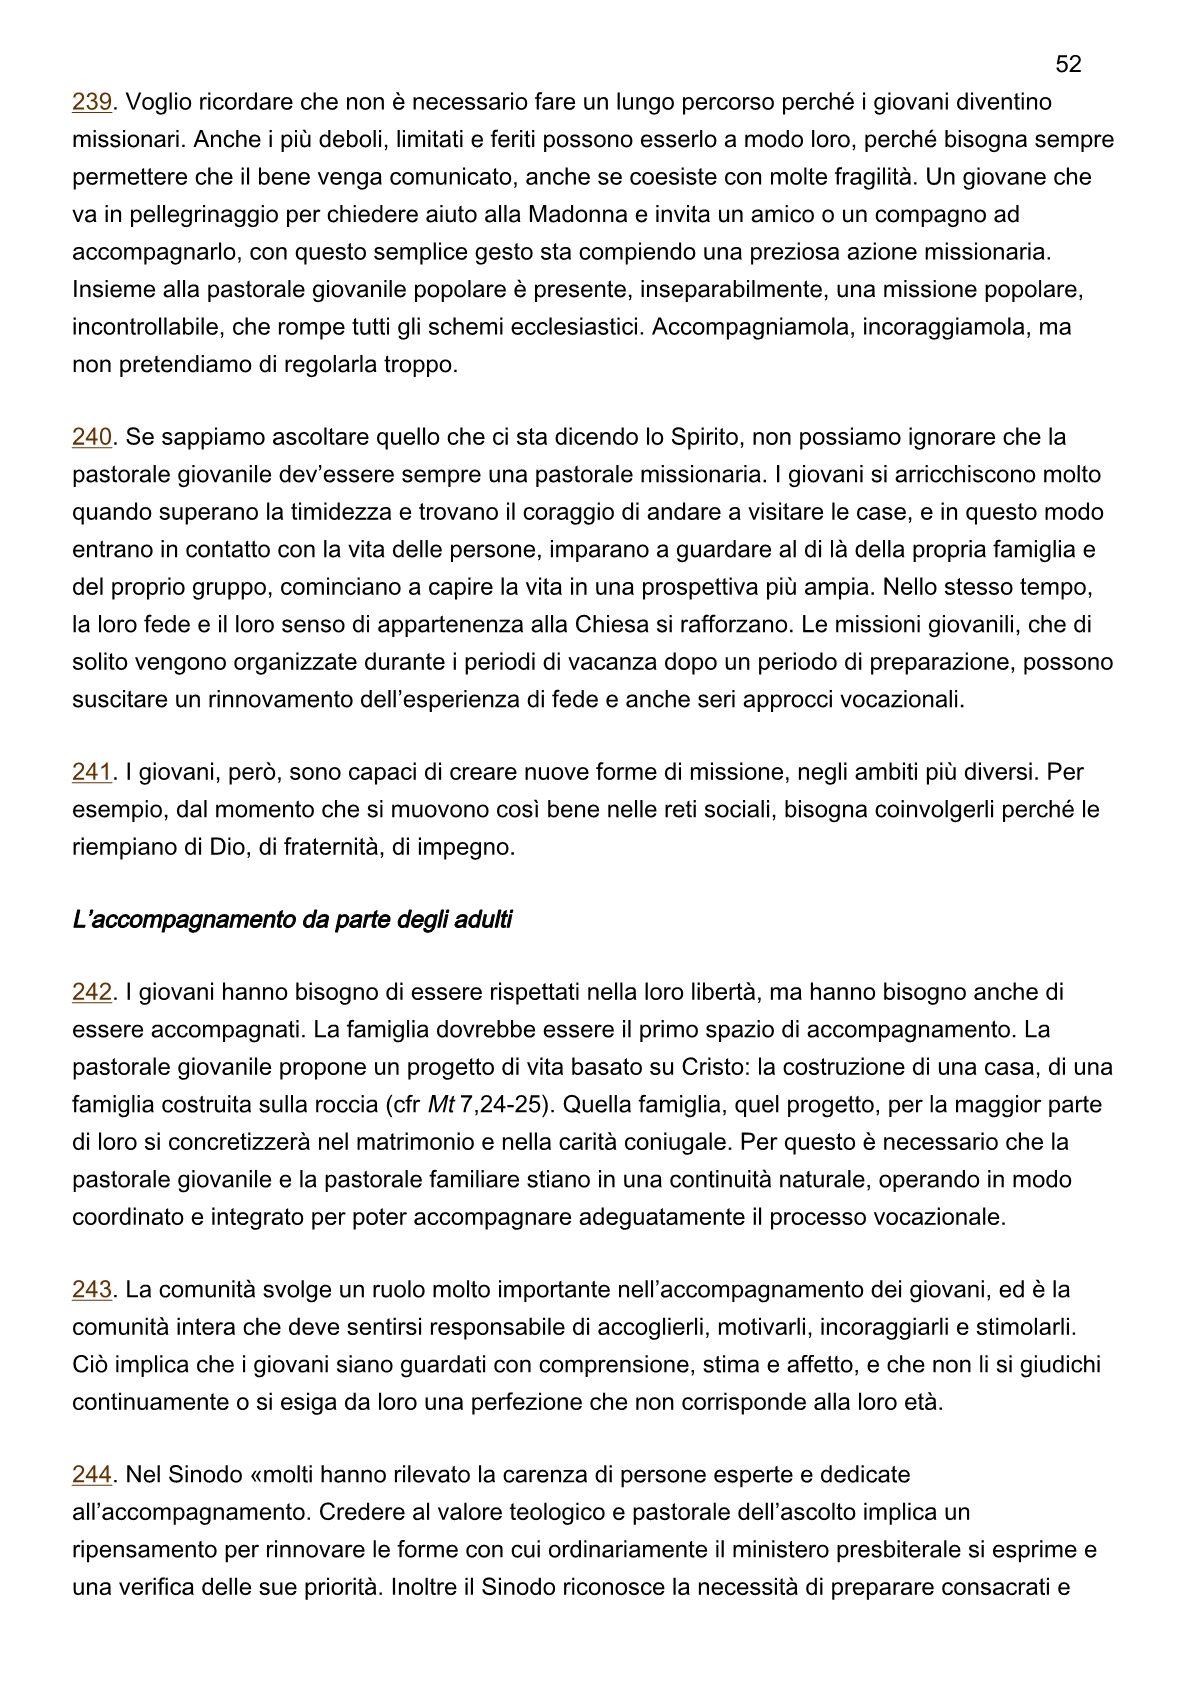 papa-francesco_esortazione-ap_20190325_christus-vivit52